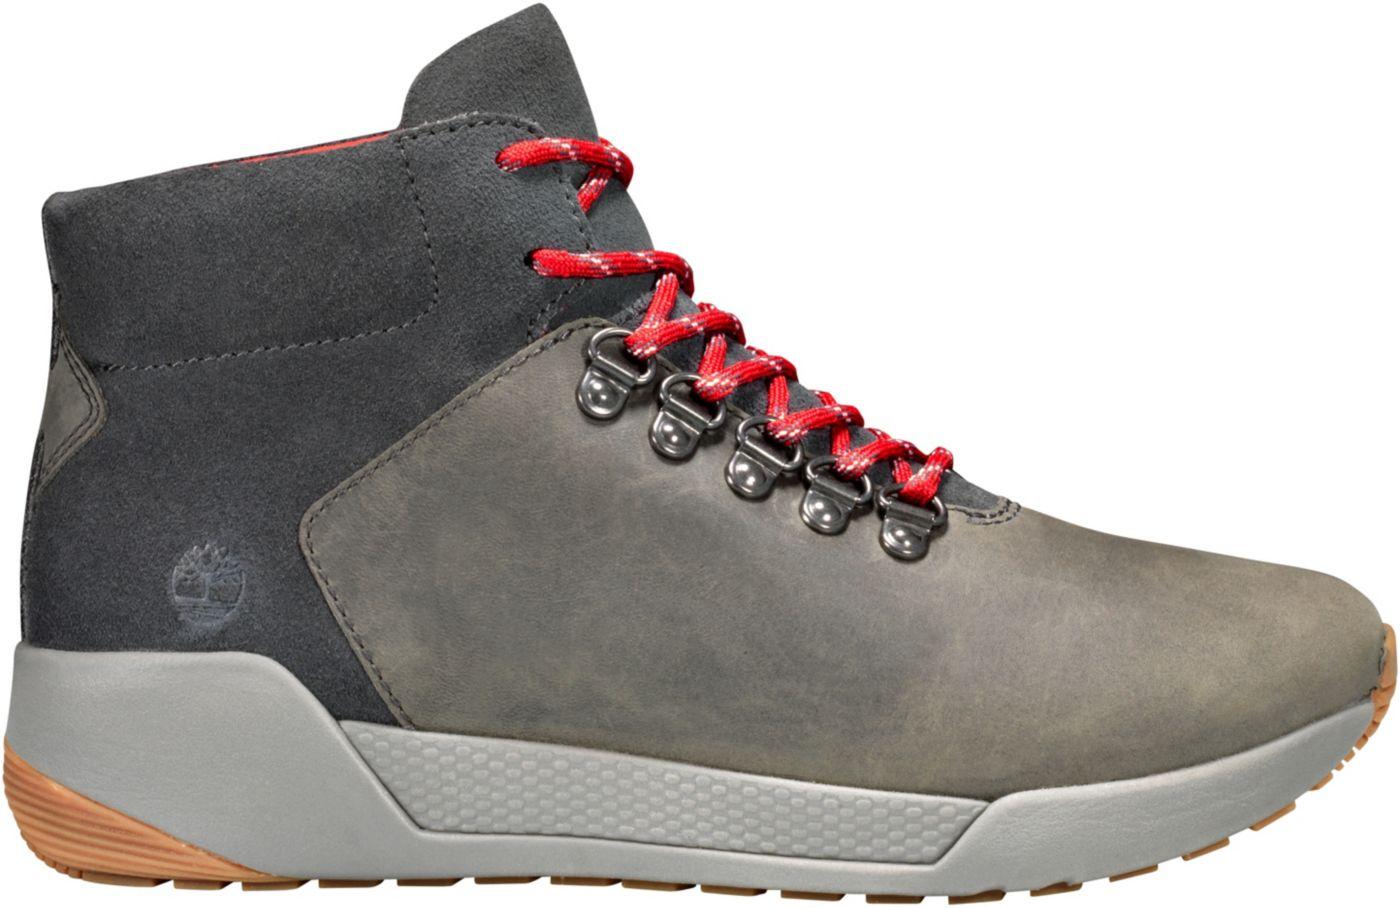 Timberland Women's Kiri Up Waterproof Hiking Shoes